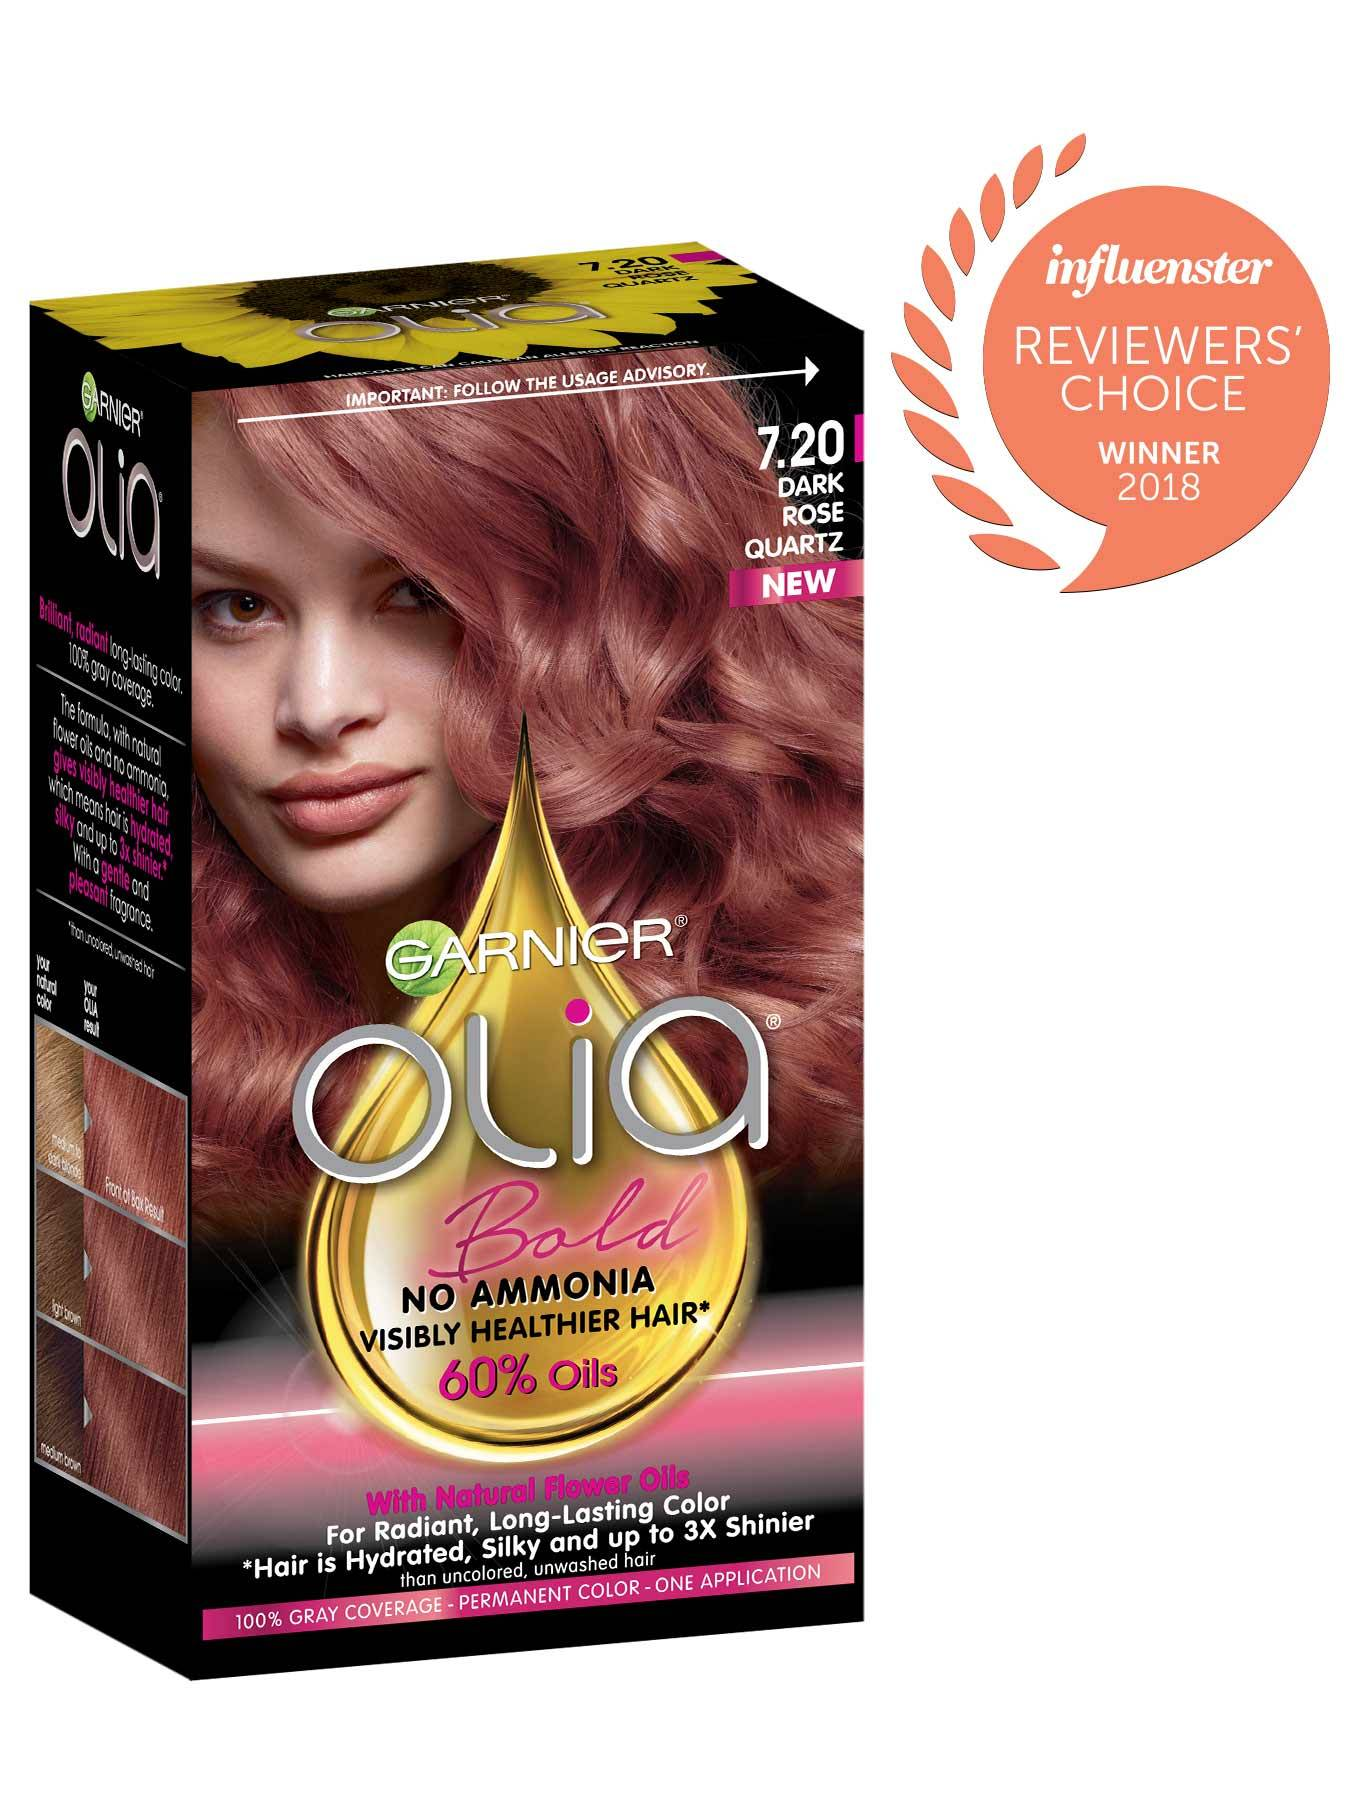 Permanent, Semi-Permanent & Temporary Pink Hair Color - Garnier